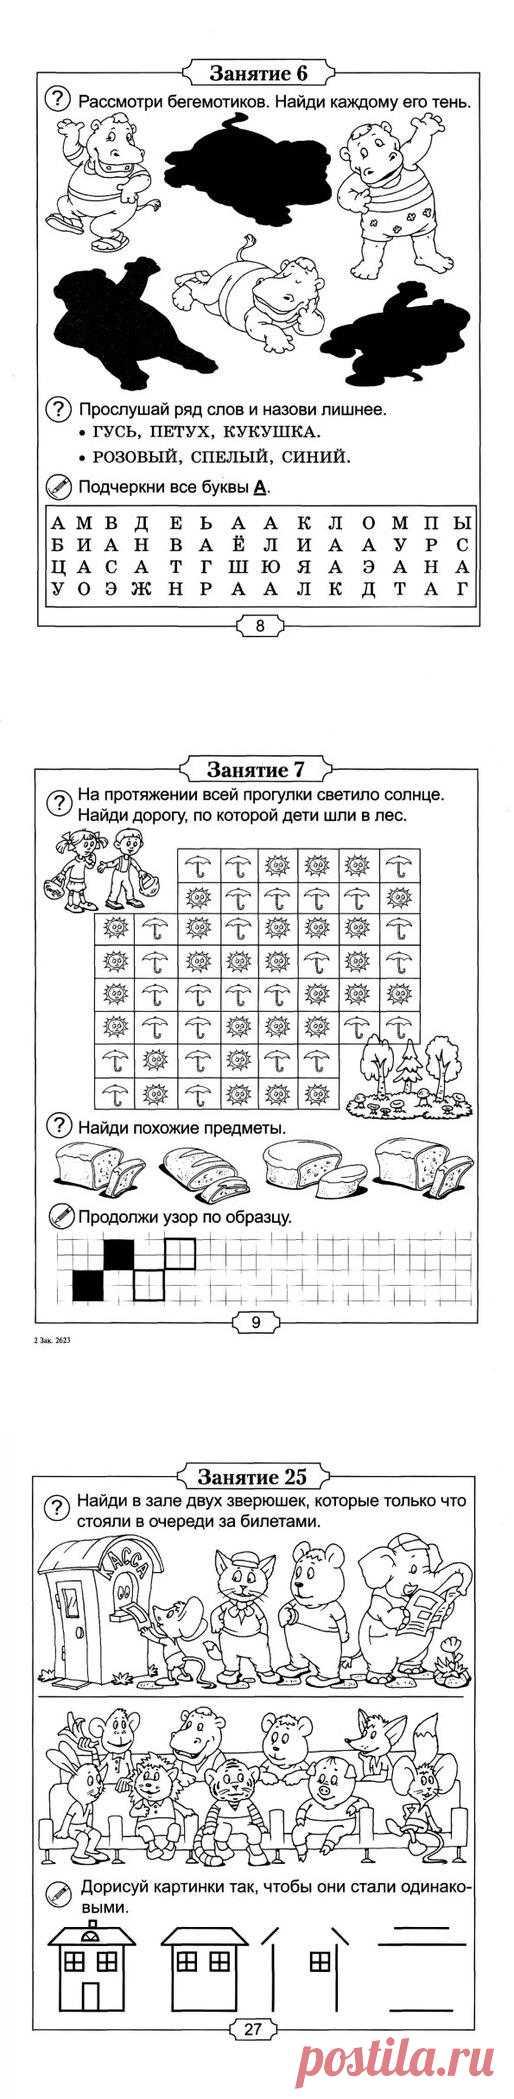 30 занятий для развития ребёнка.